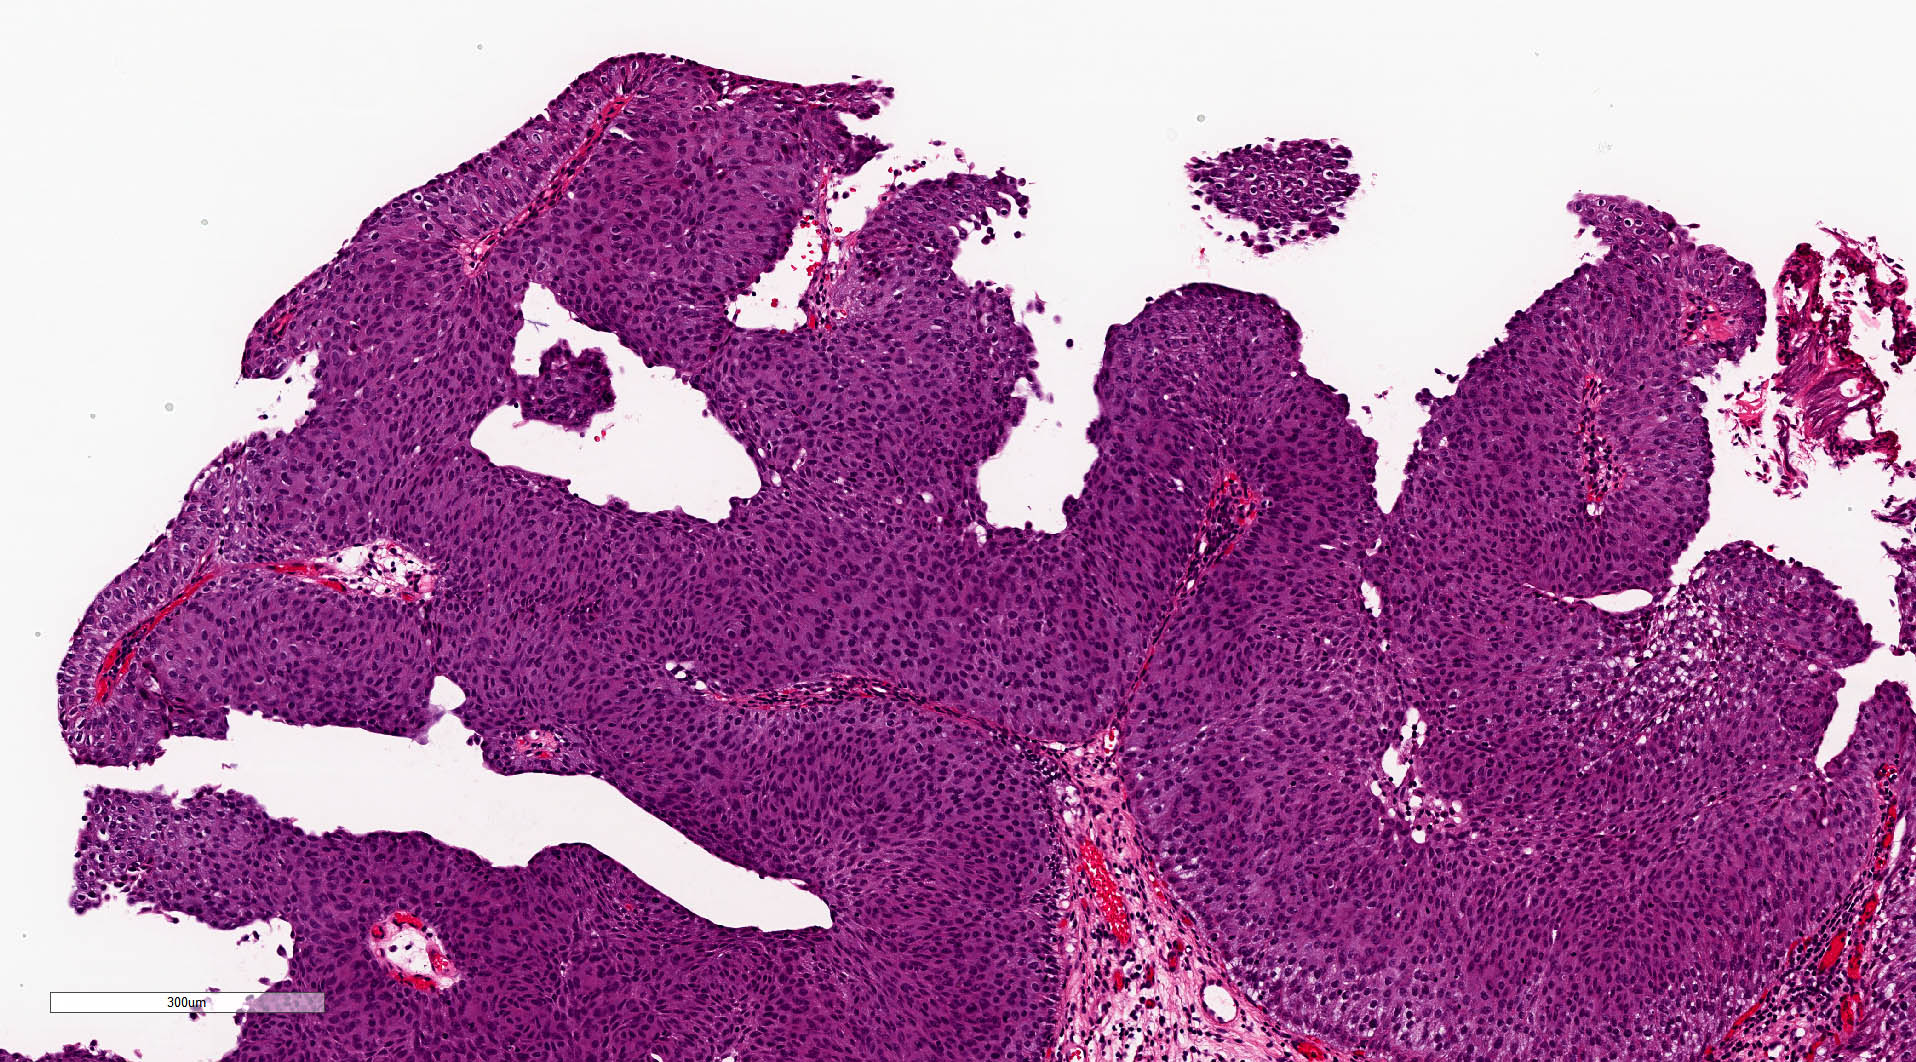 Low grade, noninvasive papillary urothelium carcinoma